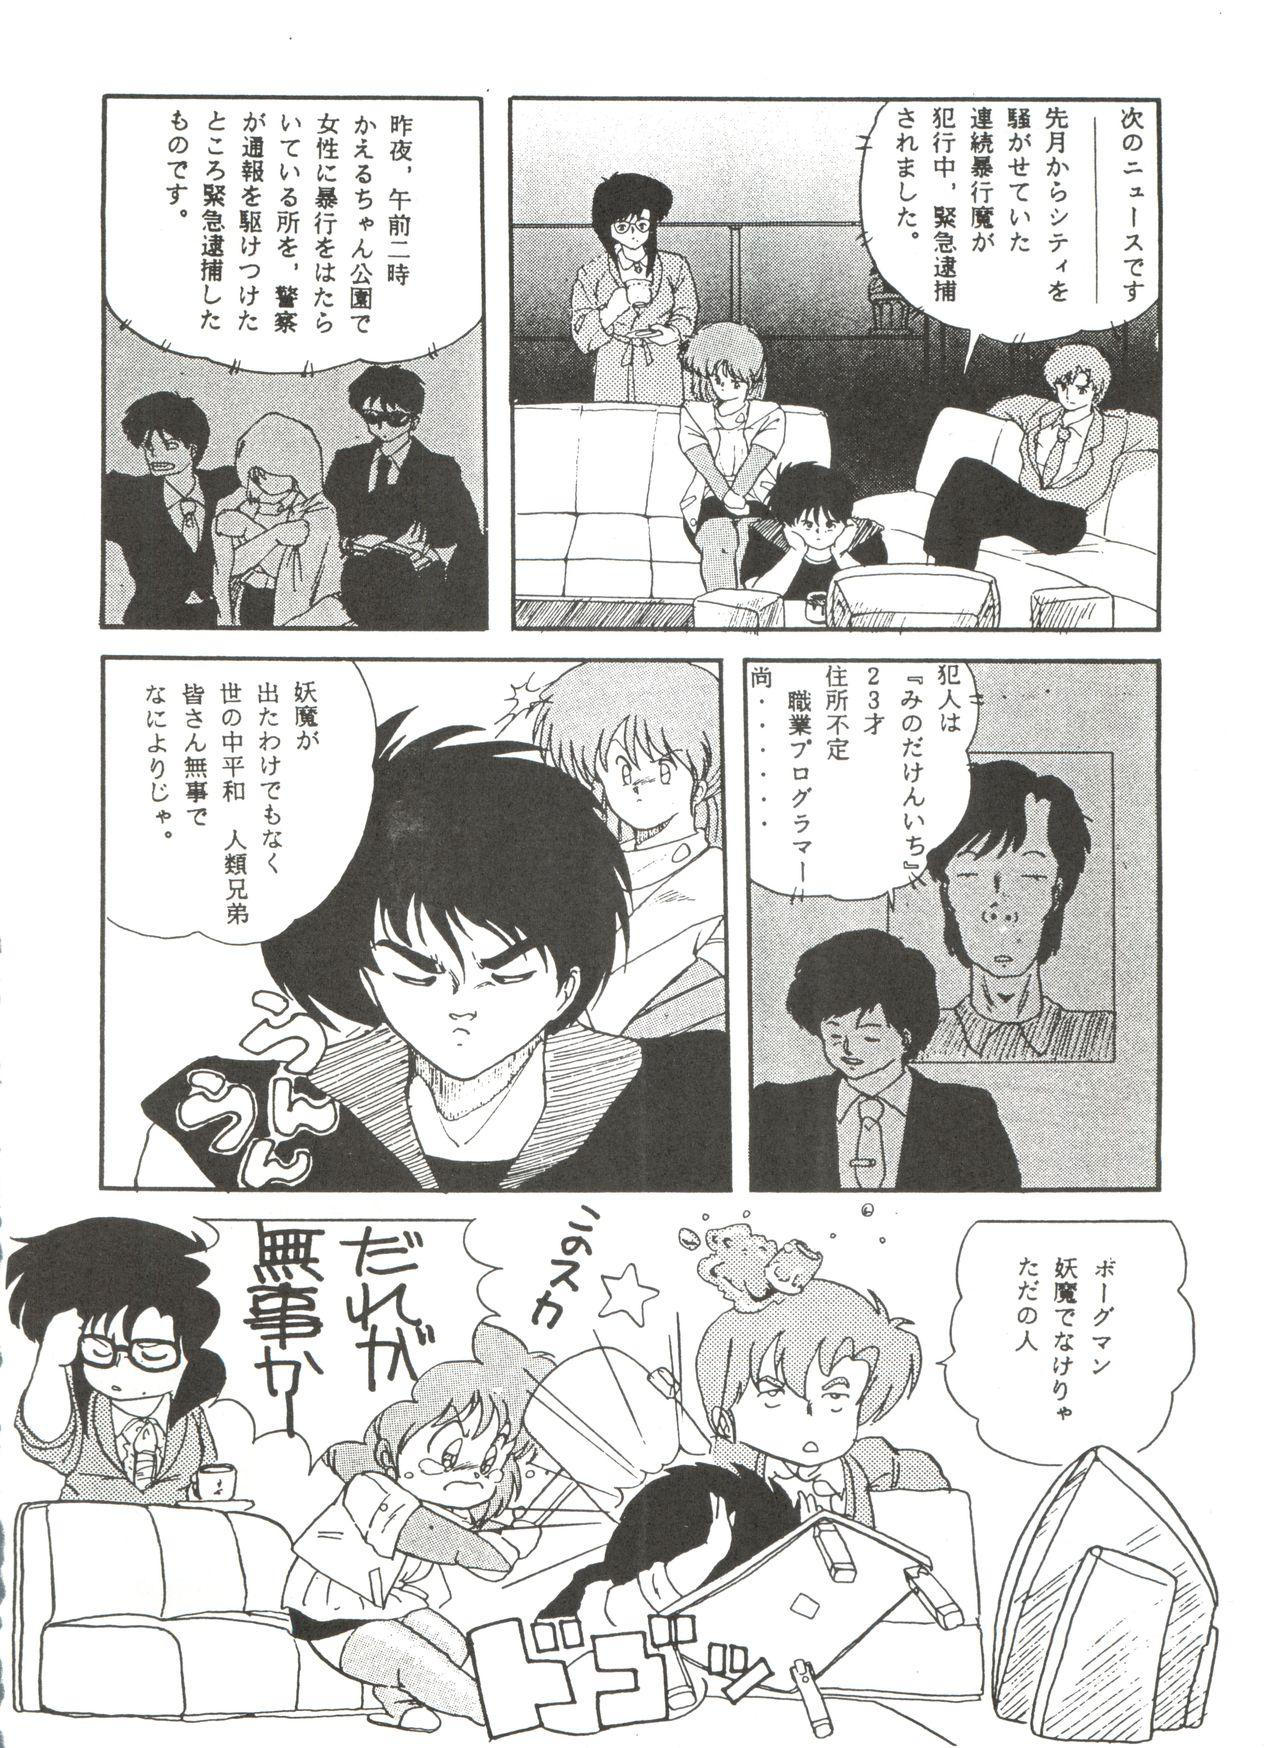 [Studio Fuck (Various) Onapet 7 (Sonic Soldier Borgman, Gundam ZZ, Osomatsu-kun) 75